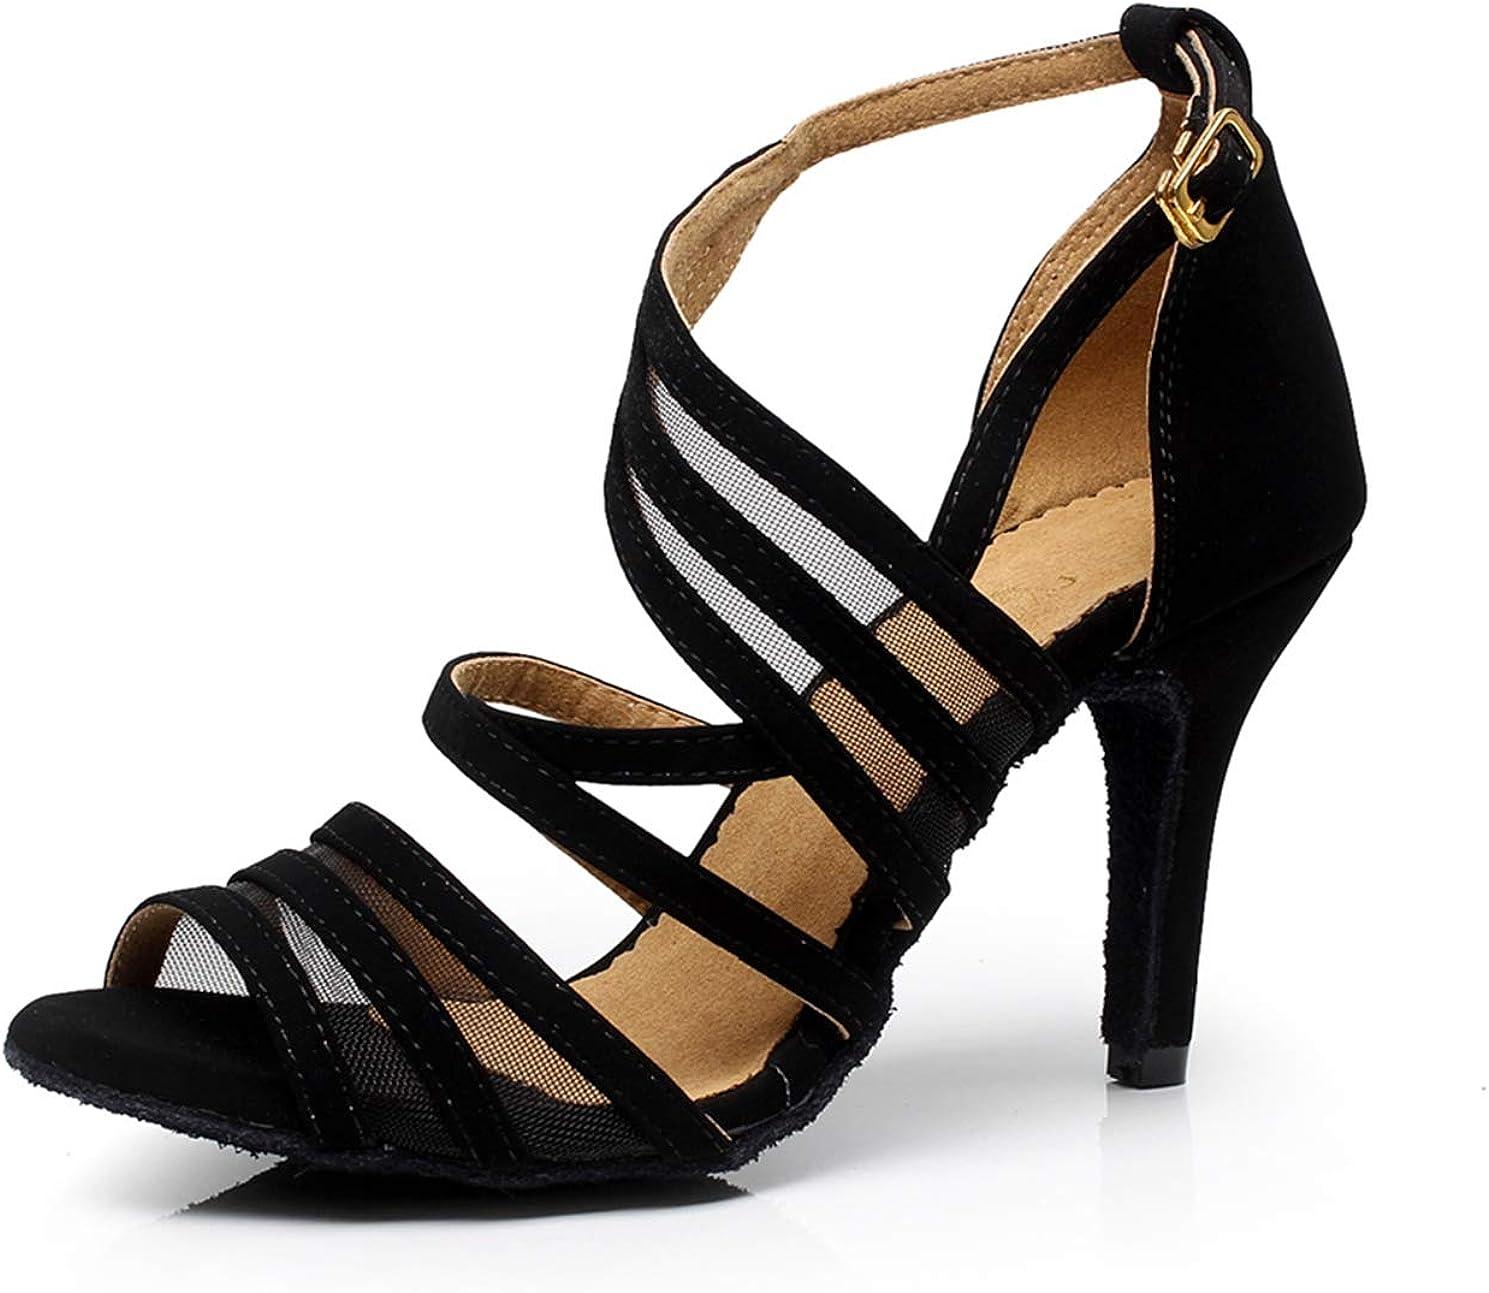 Minishion Women's Latin Salsa Ankle Wrap Ballroom Dance Shoes Evening Sandals QJ7036